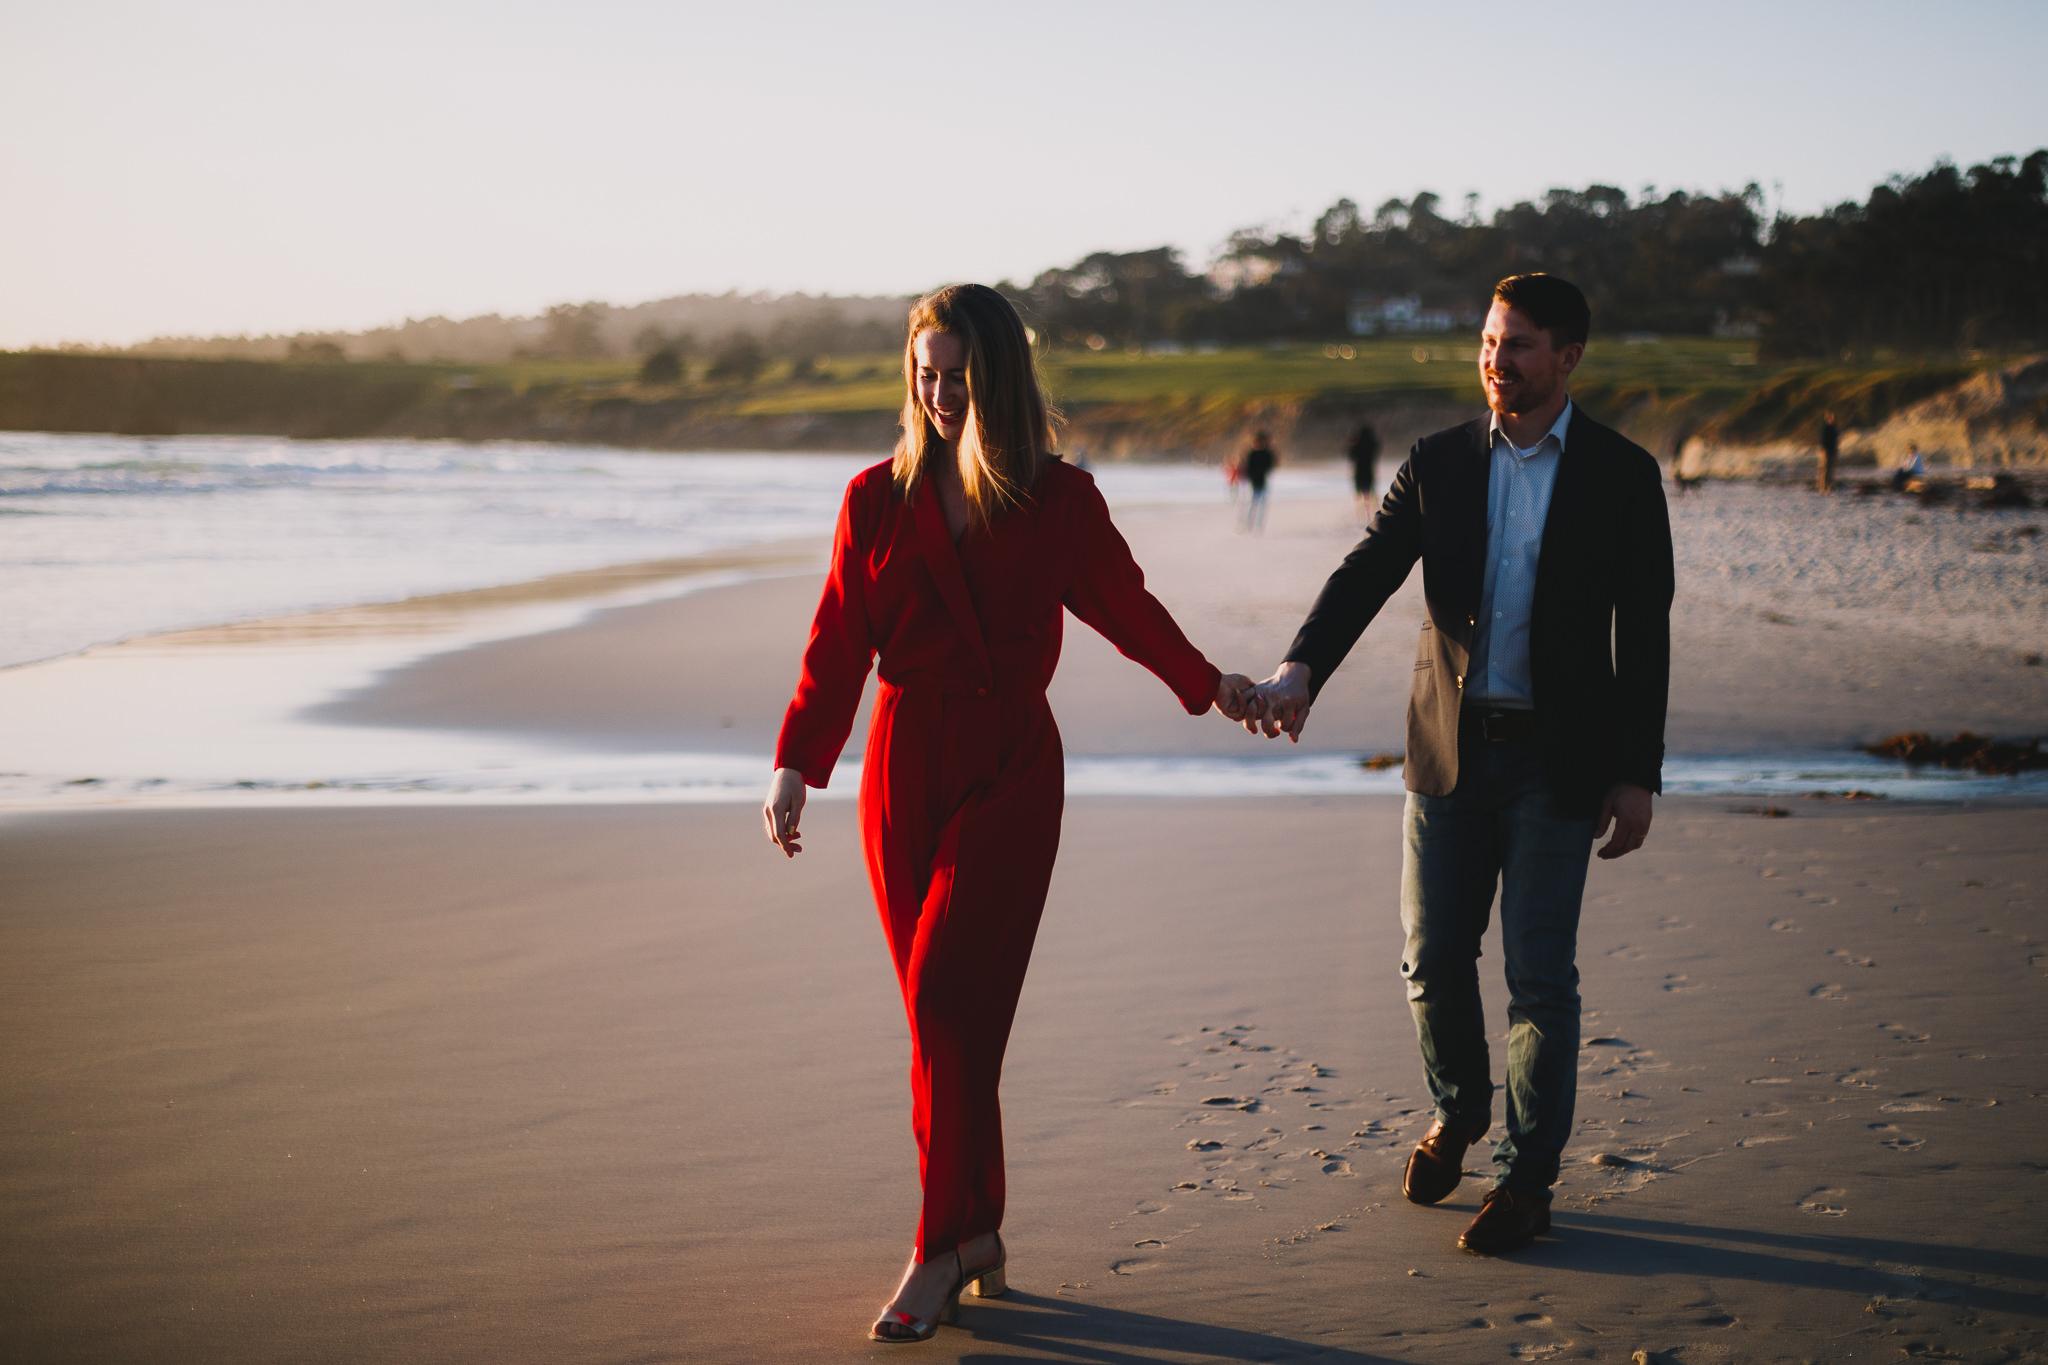 Archer Inspired Photography Carmel Beach California Wedding Engagement Lifestyle Anniversary Natural Light Photographer-15.jpg